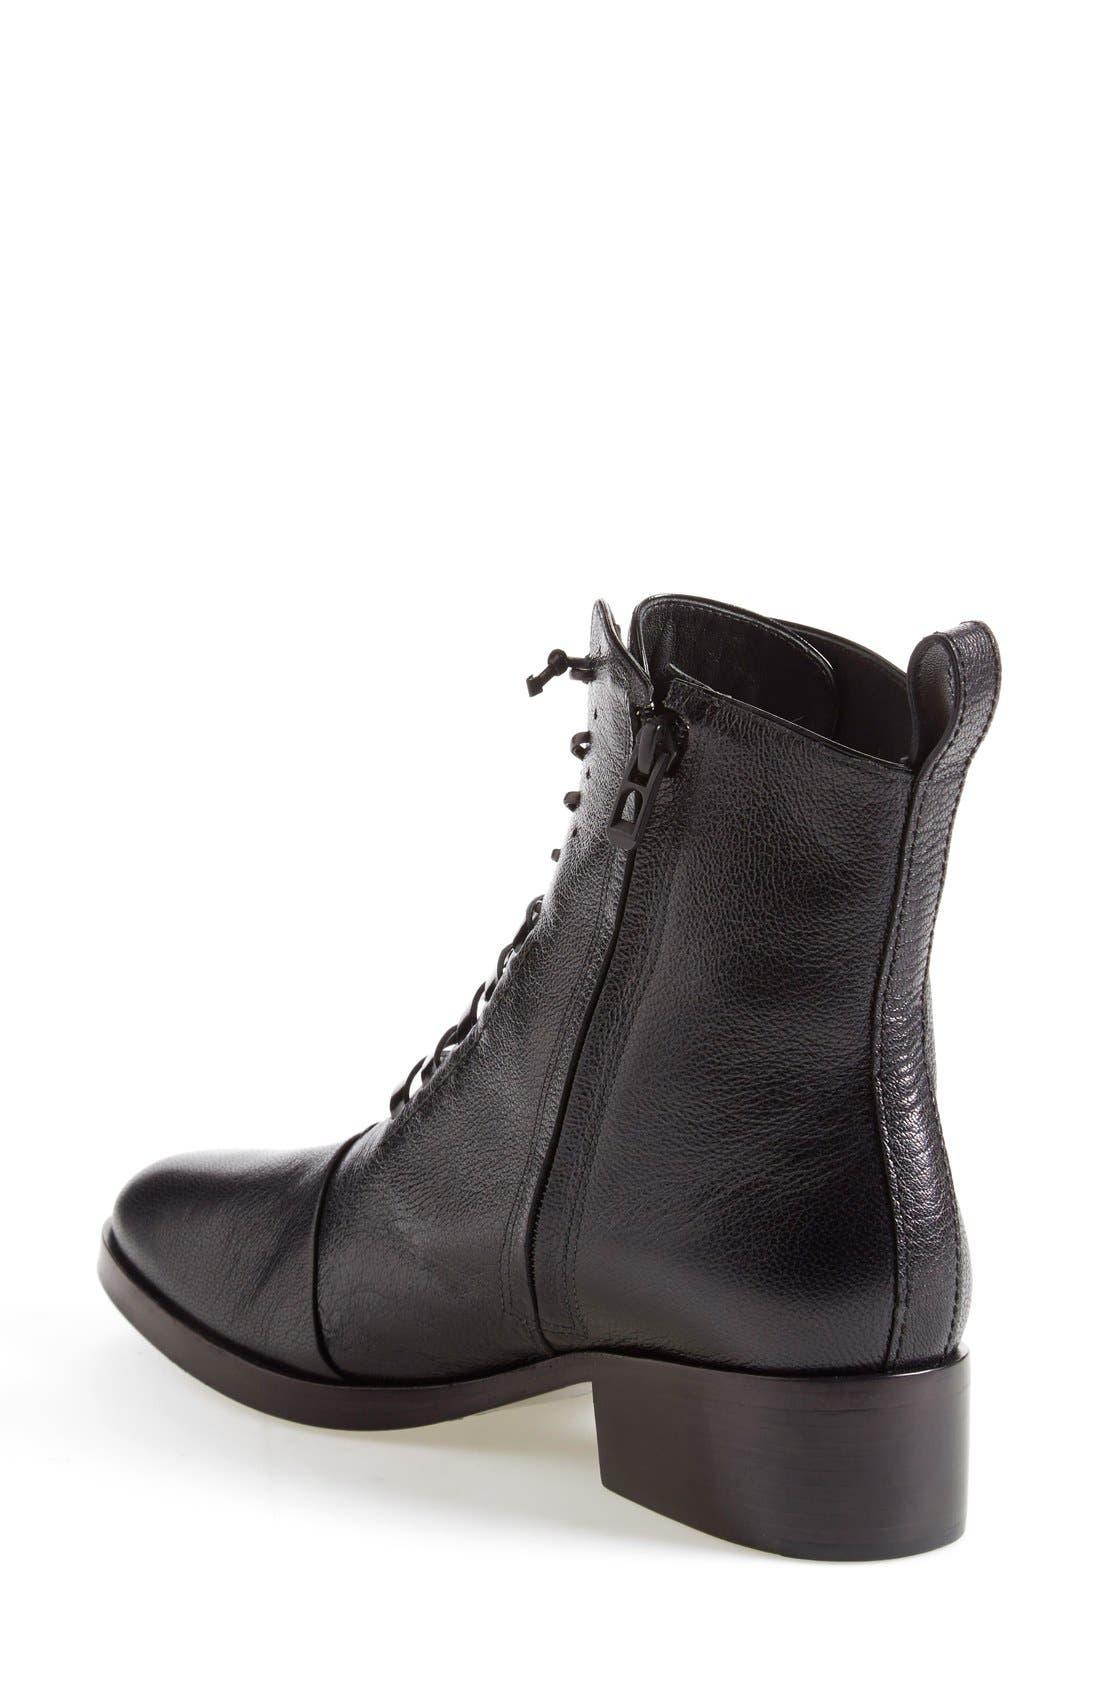 Alternate Image 2  - 3.1 Phillip Lim 'Alexa' Lace-Up Ankle Boot (Women)